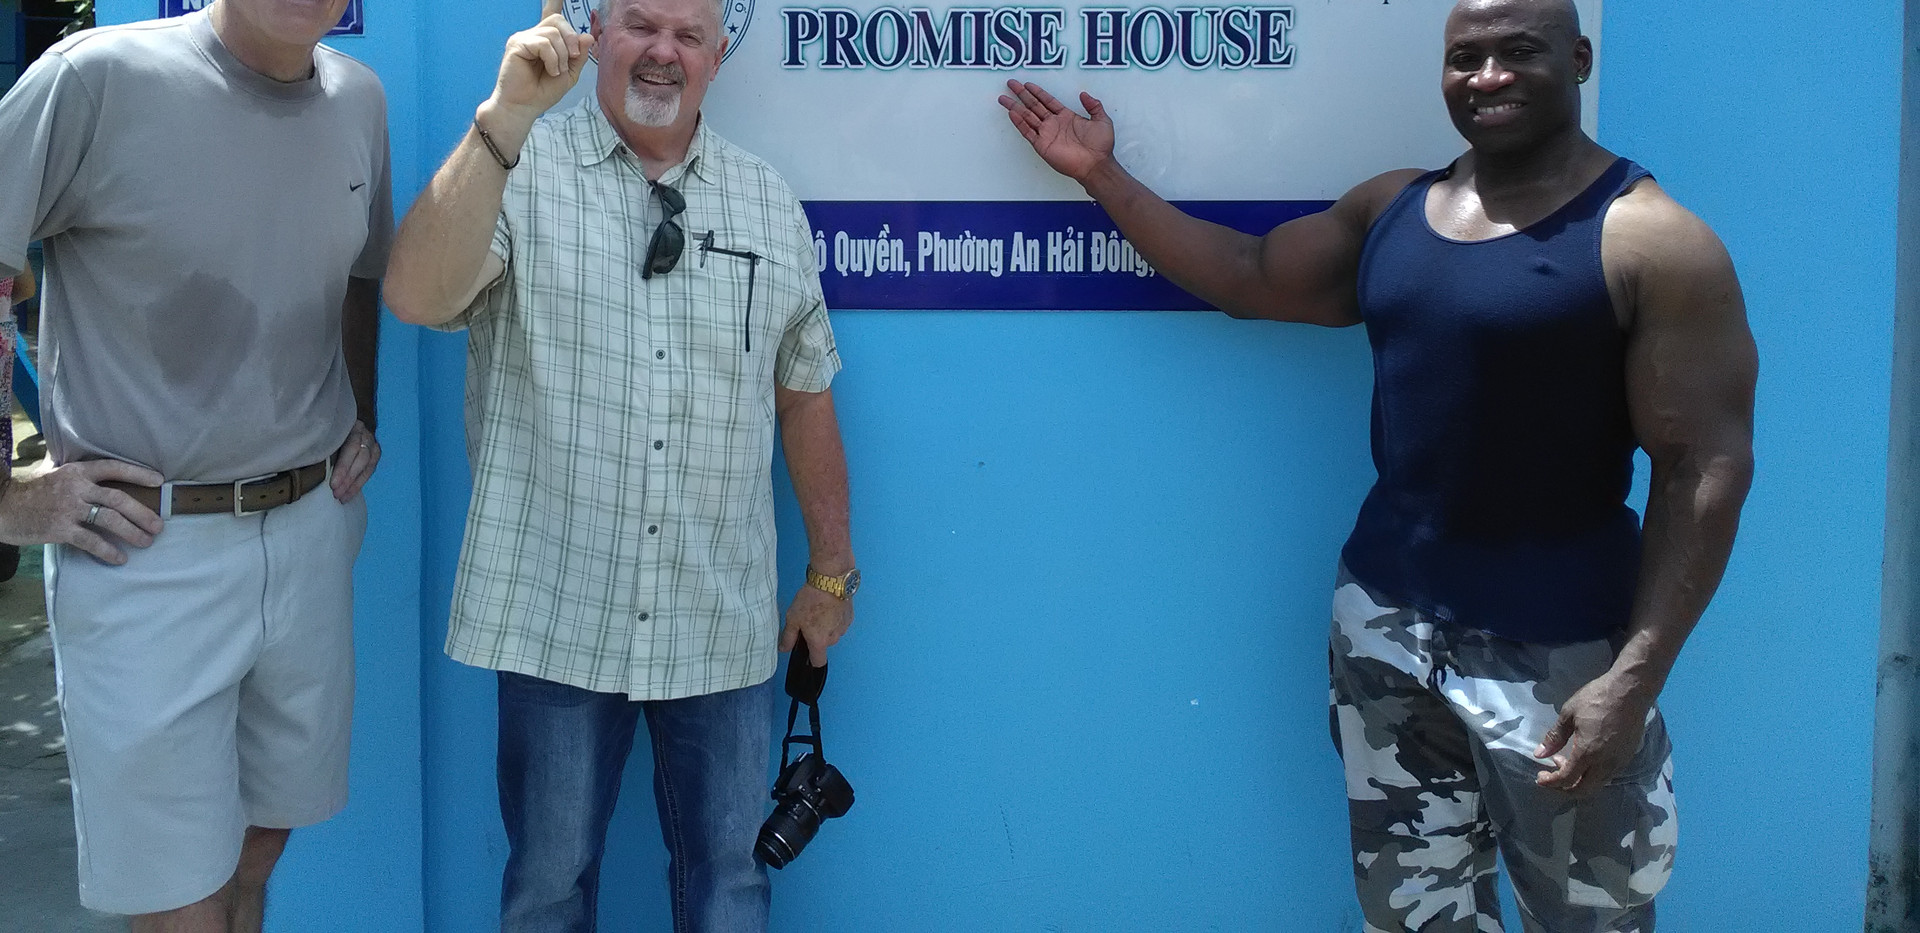 Promise House.jpg